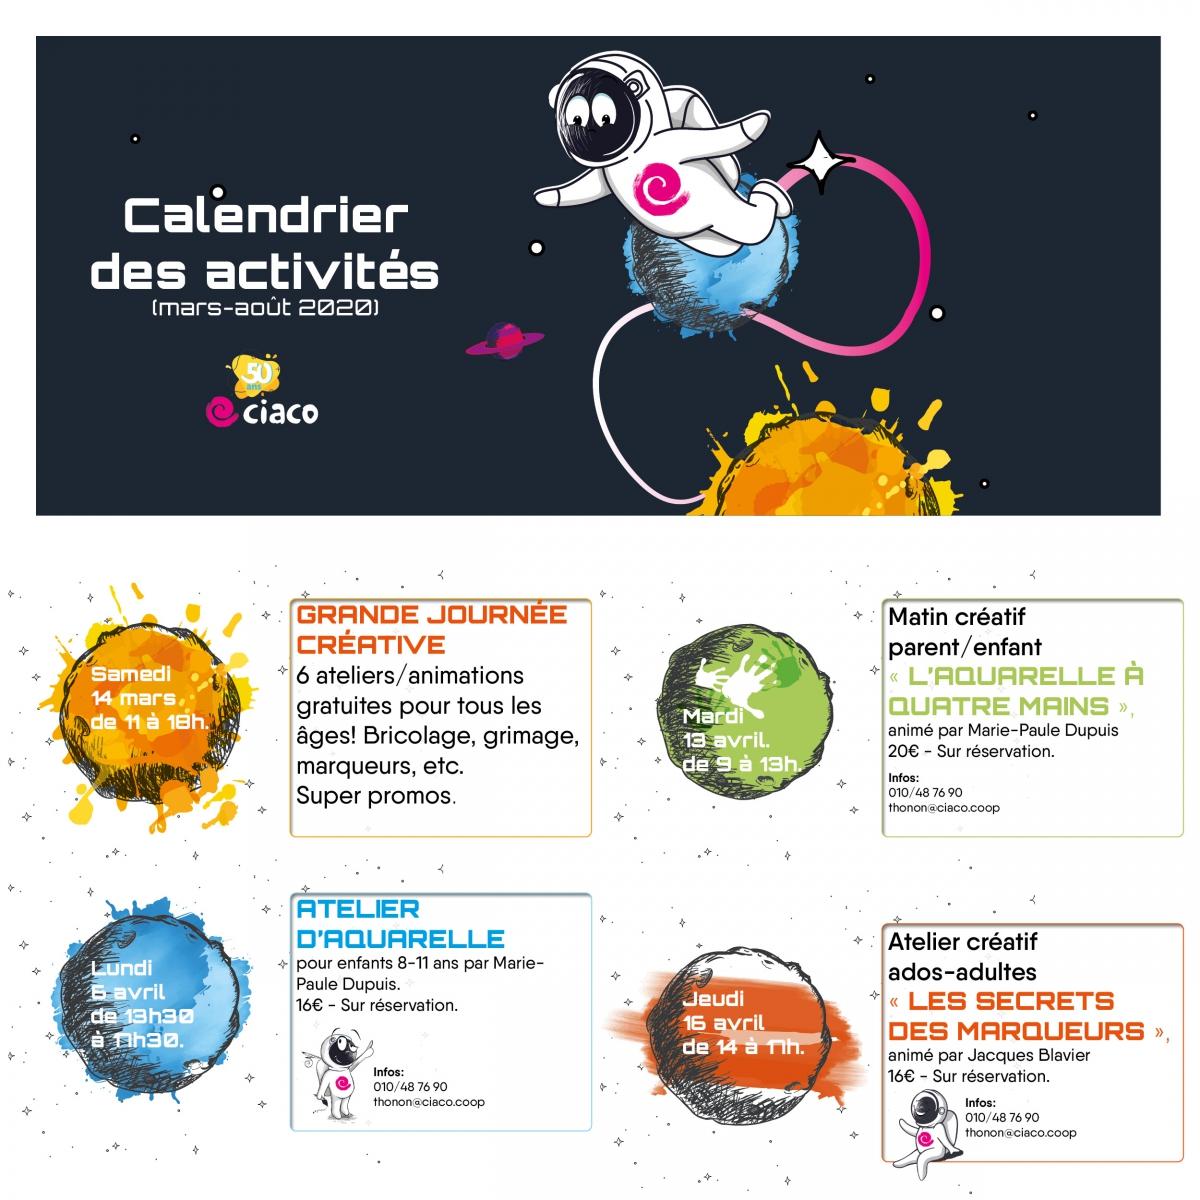 Calendrier des activités (mars-août)